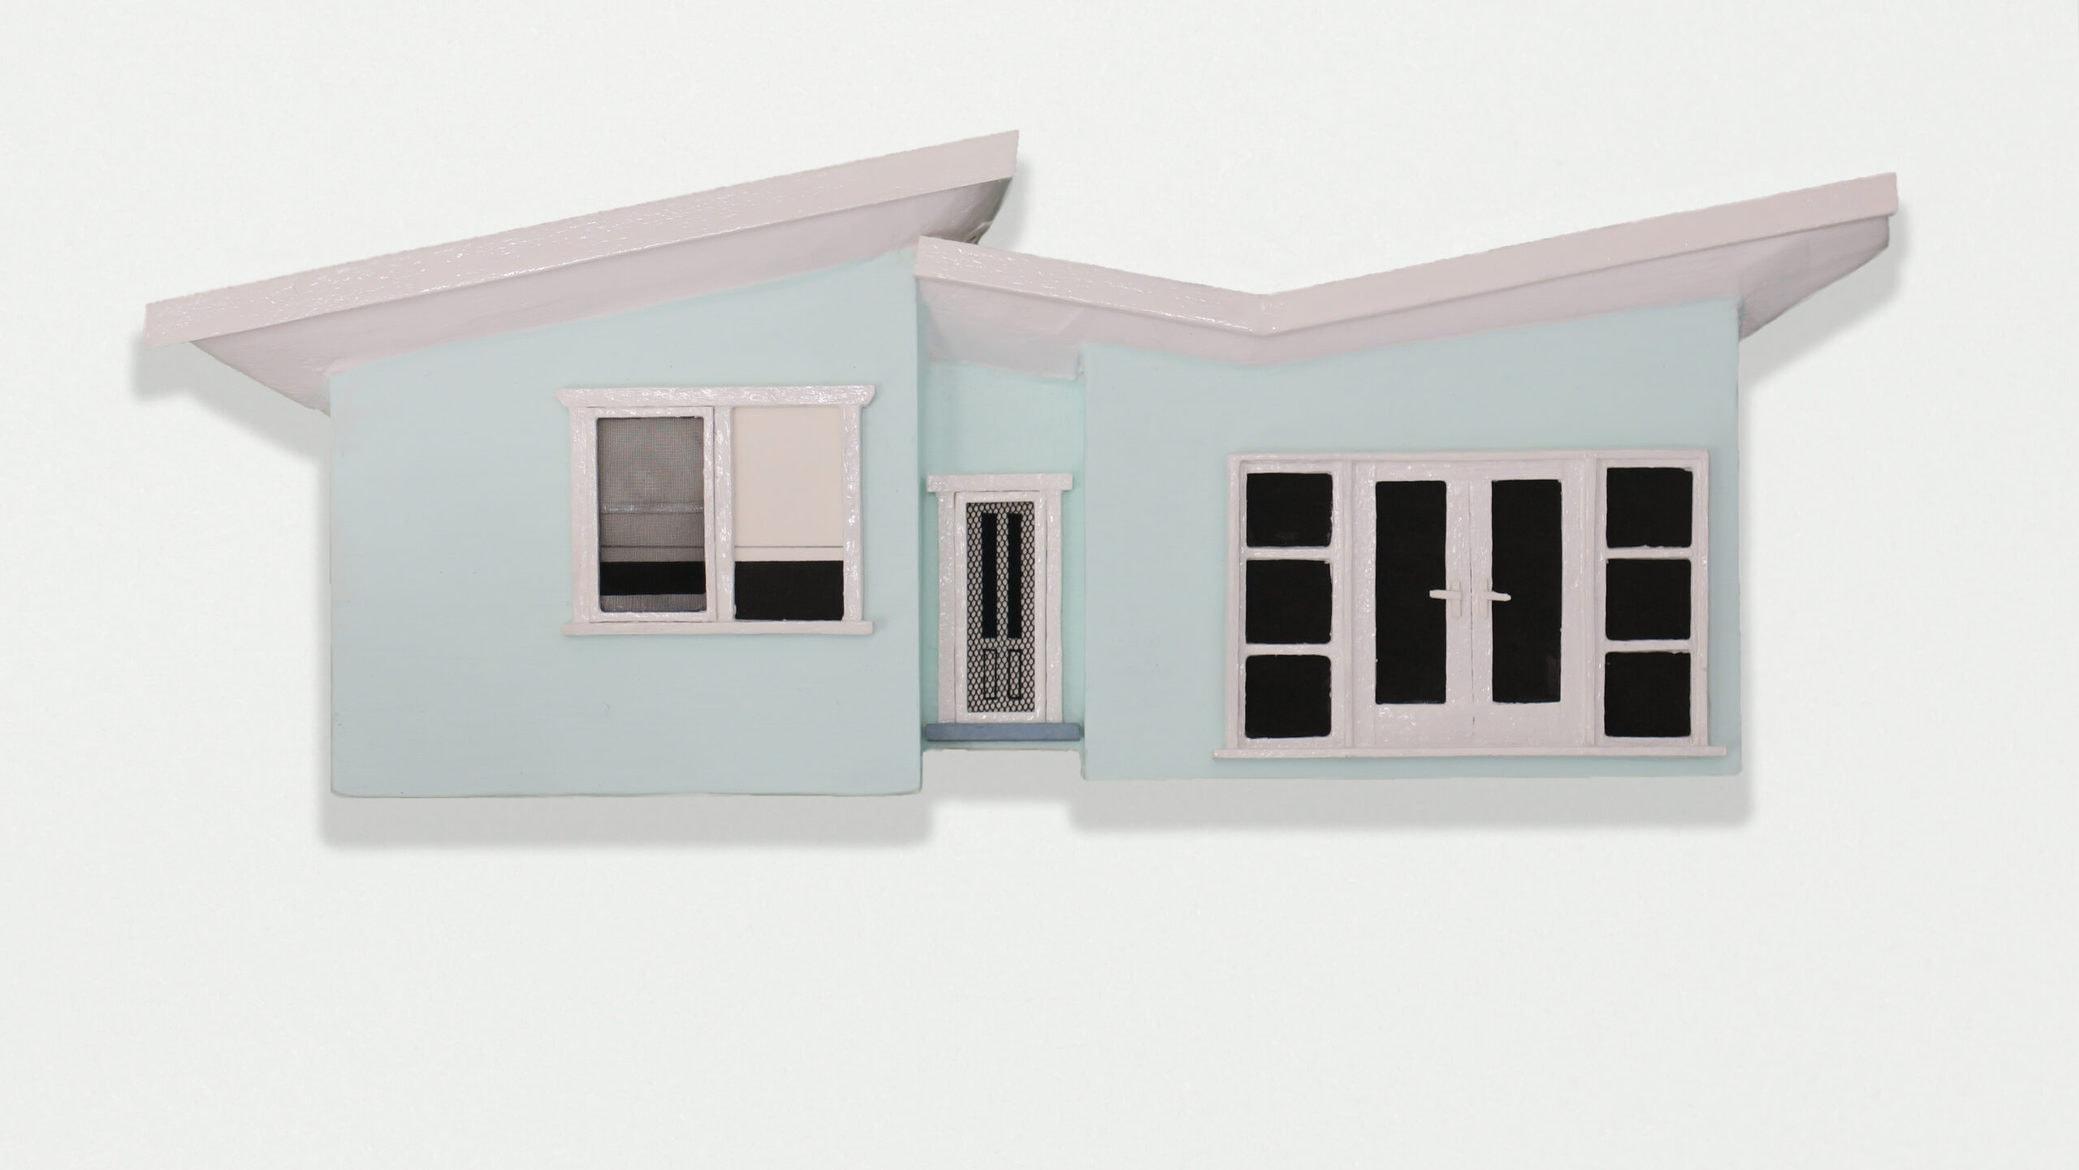 'Suburban Fibro Series #9', 2020, balsa wood and mixed media, 11 x 28 x 2.5 cm